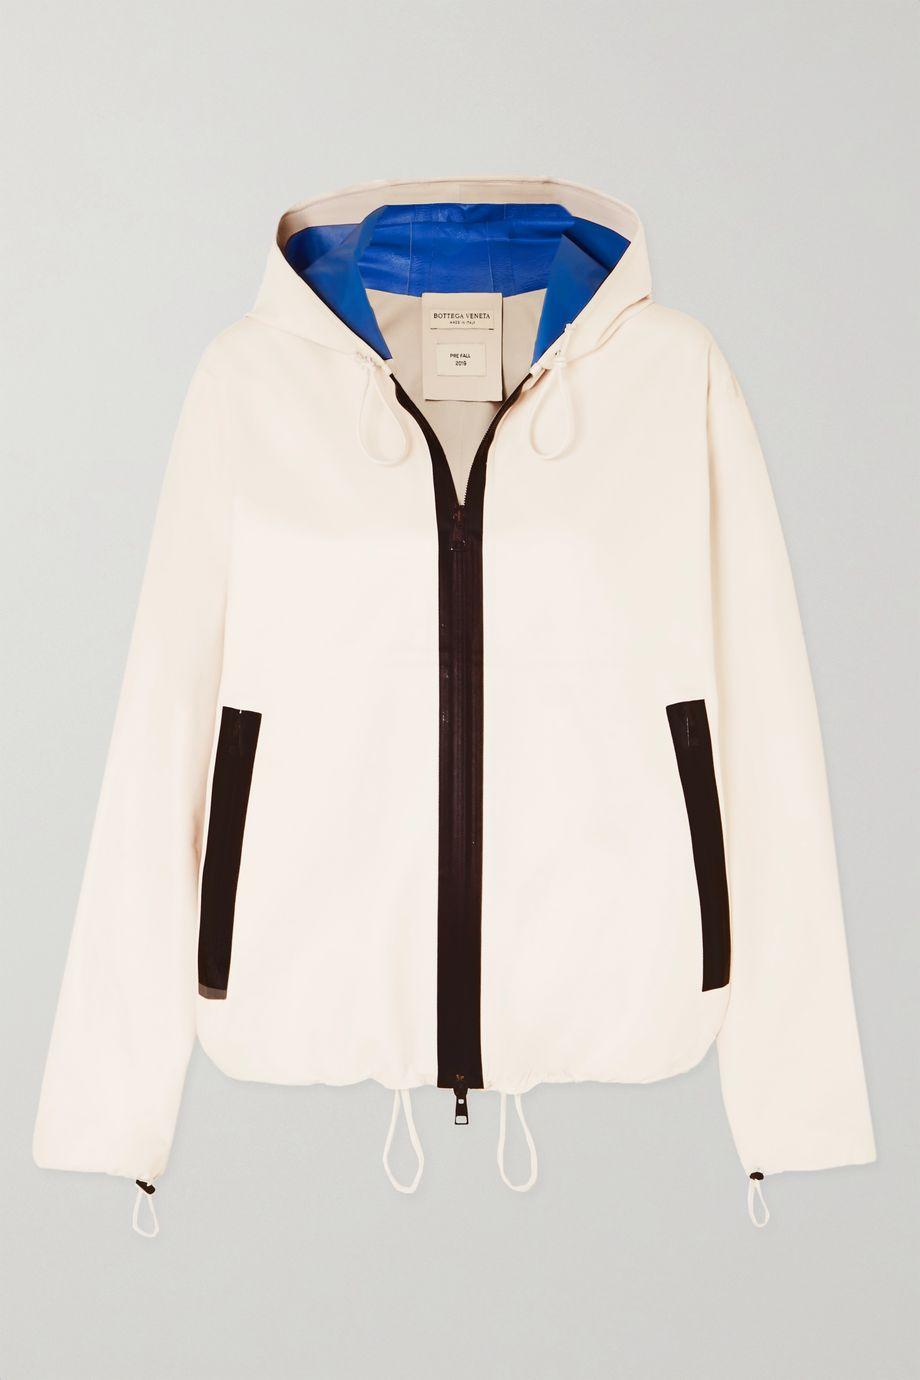 Bottega Veneta Hooded two-tone leather jacket